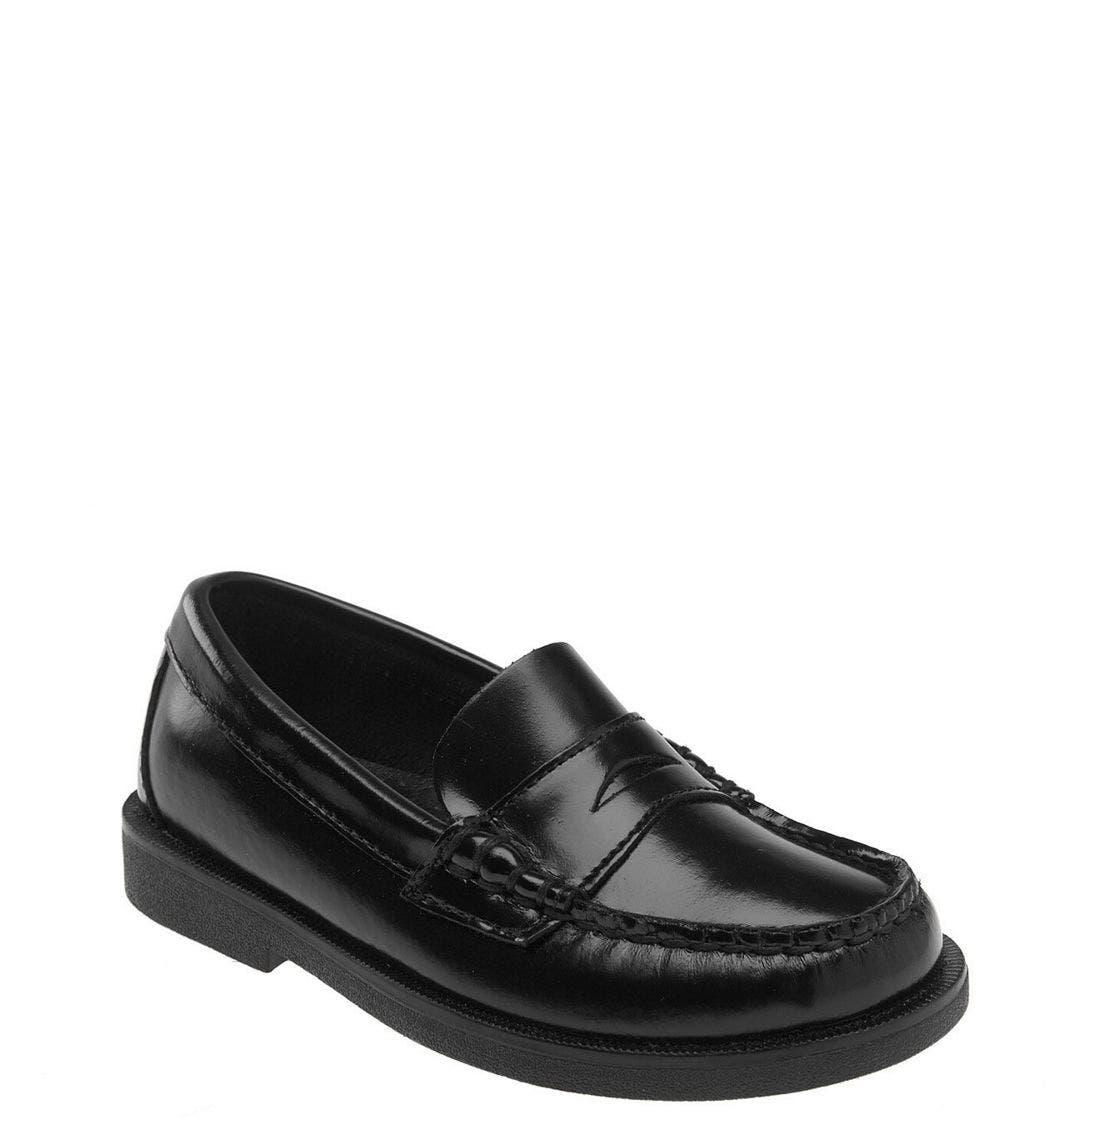 SPERRY KIDS 'Colton' Loafer, Main, color, BLACK LEATHER